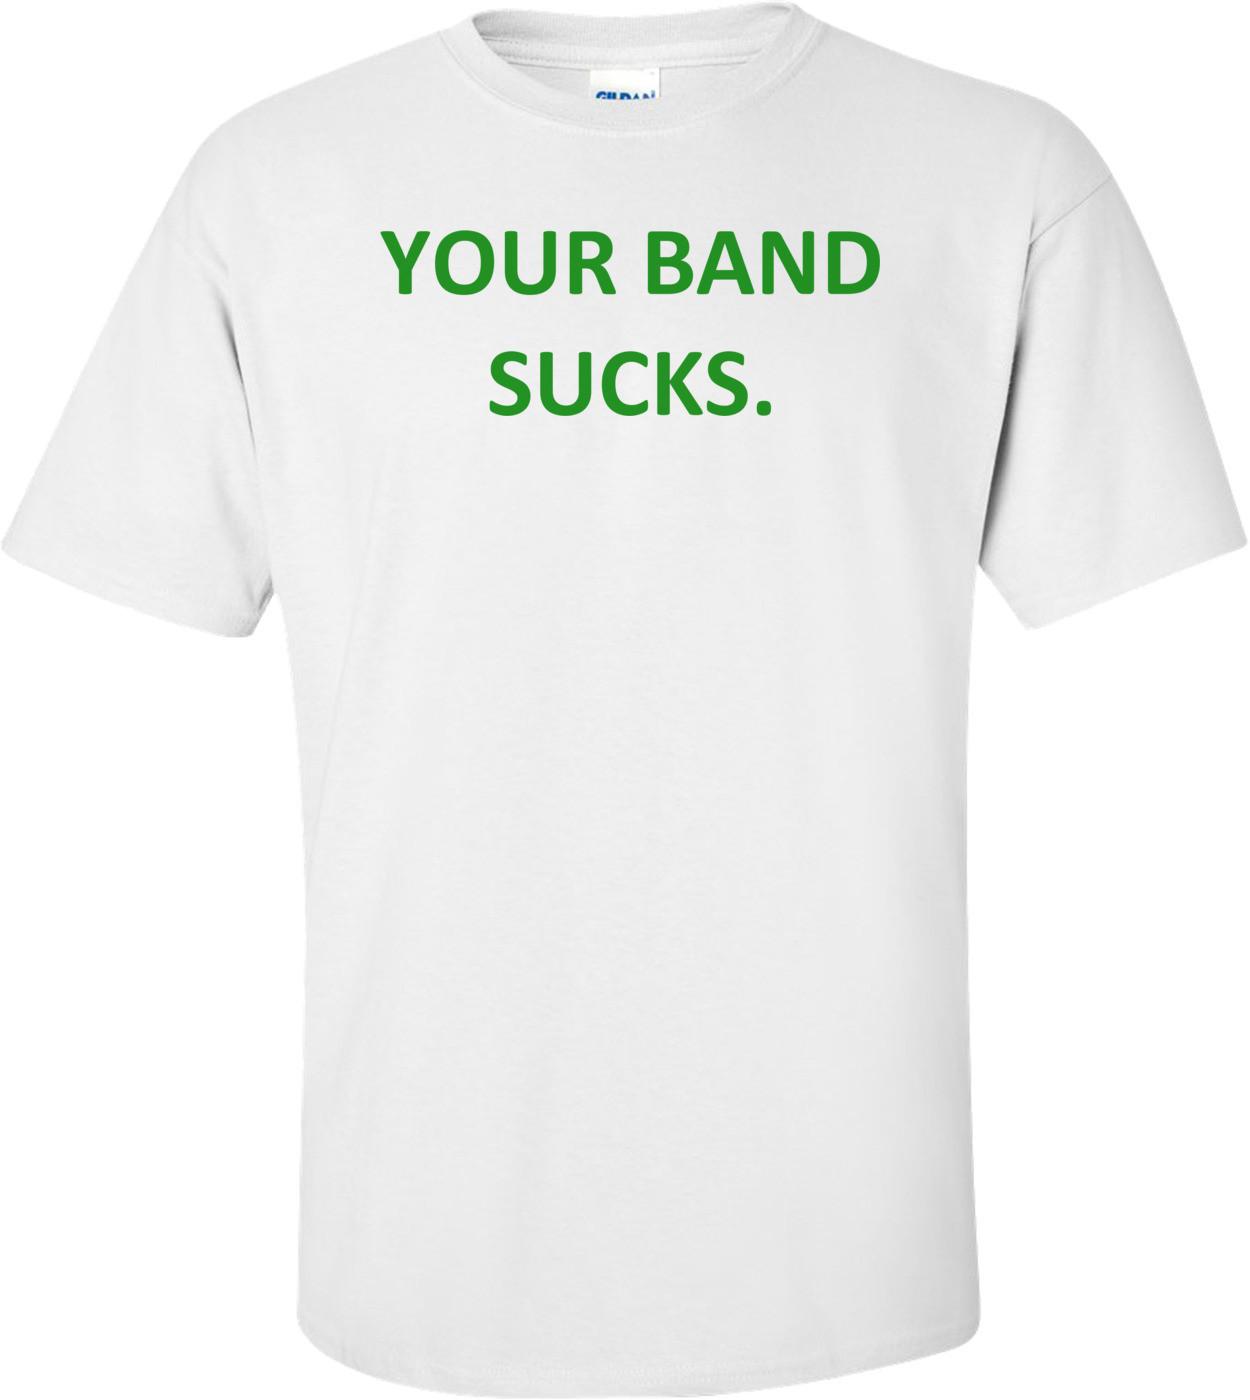 YOUR BAND SUCKS. Shirt